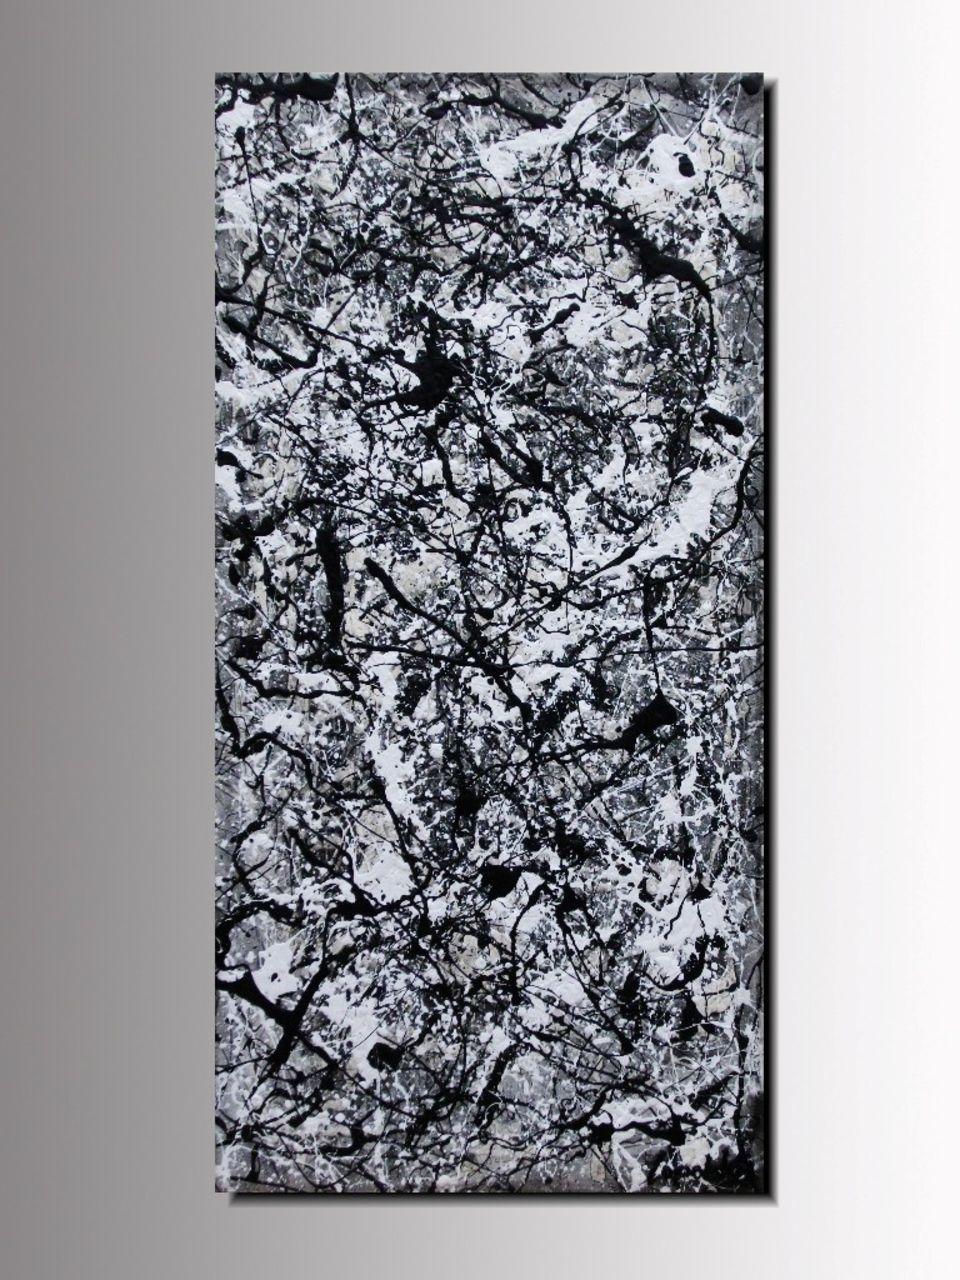 LEPOLSK MATUSZEWSKI  PLATINUM expressionnisme abstrait contemporain Lepolsk Matuszewski 2011 artiste peintre plasticien - Copie